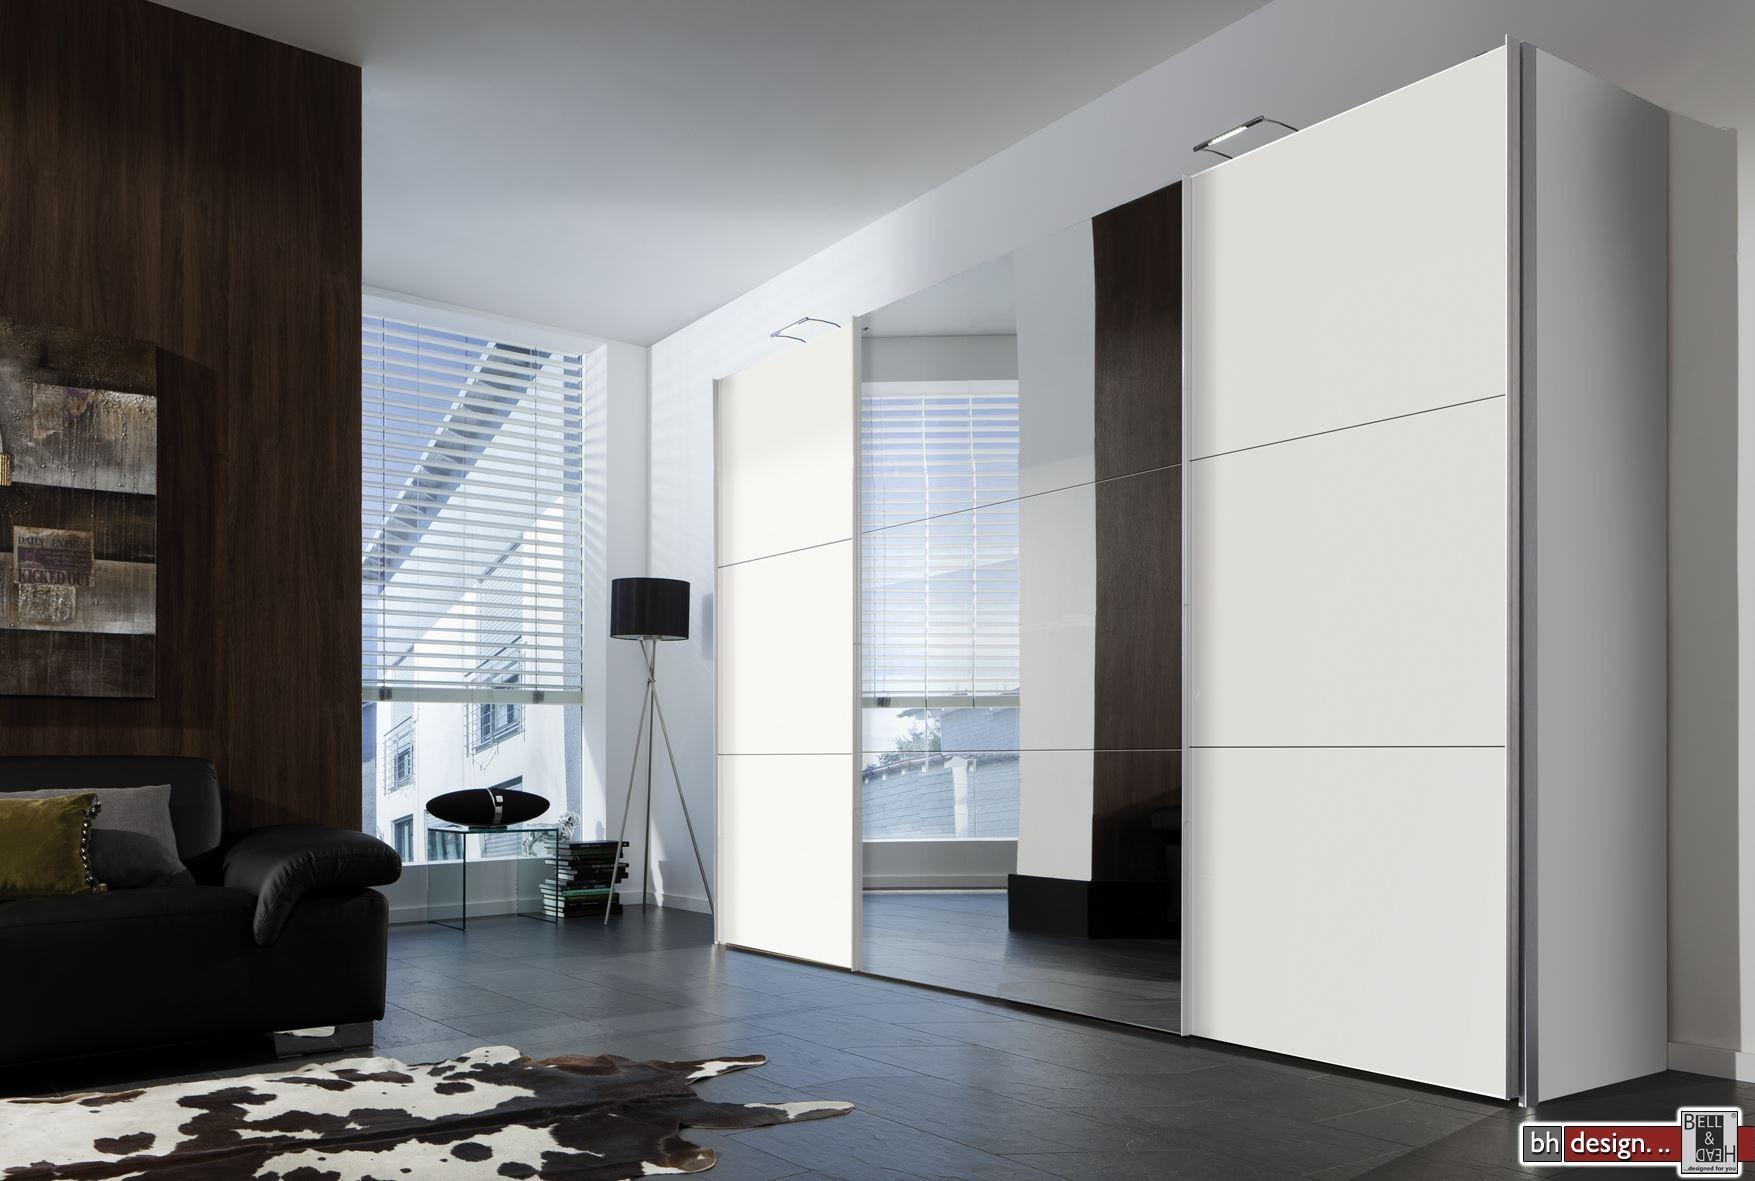 express m bel schwebet renschrank stars mit spiegel 150 cm bis 350 cm h he 216 cm oder h he. Black Bedroom Furniture Sets. Home Design Ideas